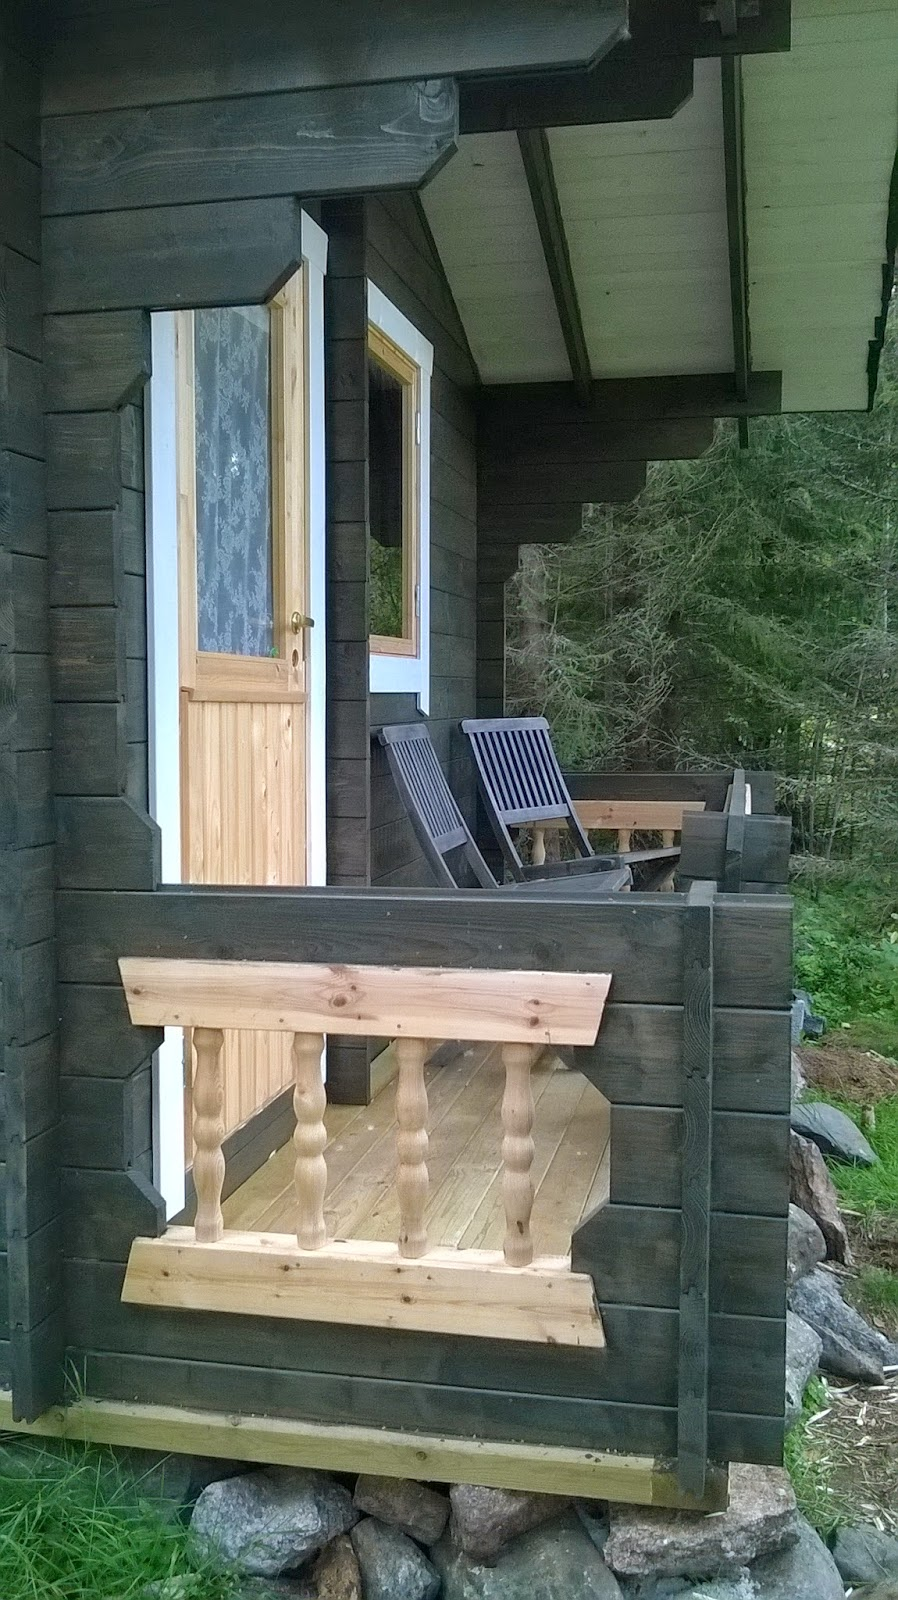 ulkosauna, pihasauna, parra sauna, Parra-sauna 5